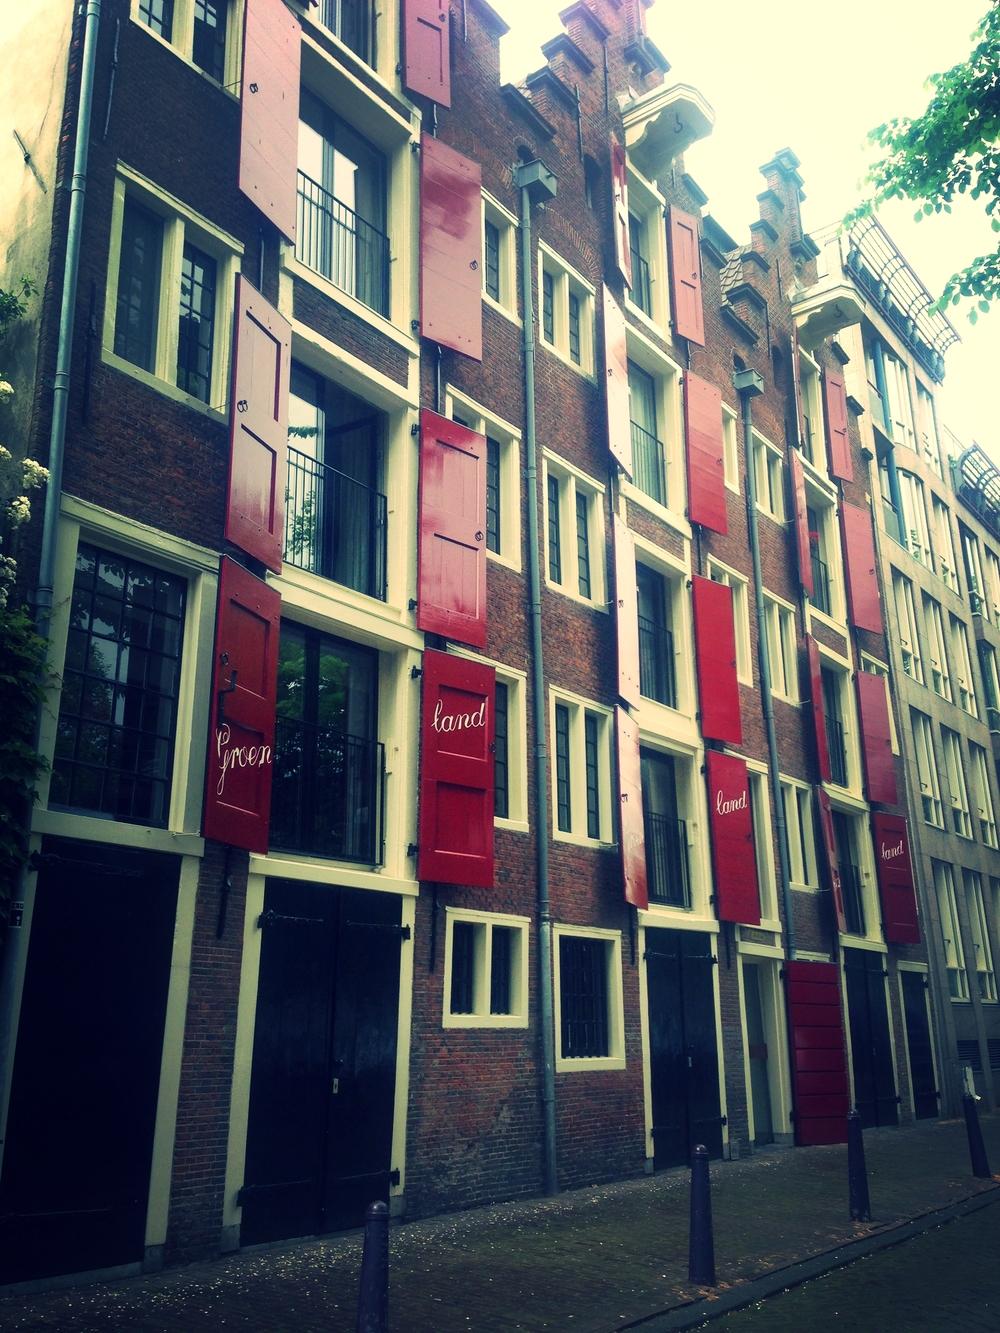 Taken with my iphone.  In Amsterdam, The Jordaan